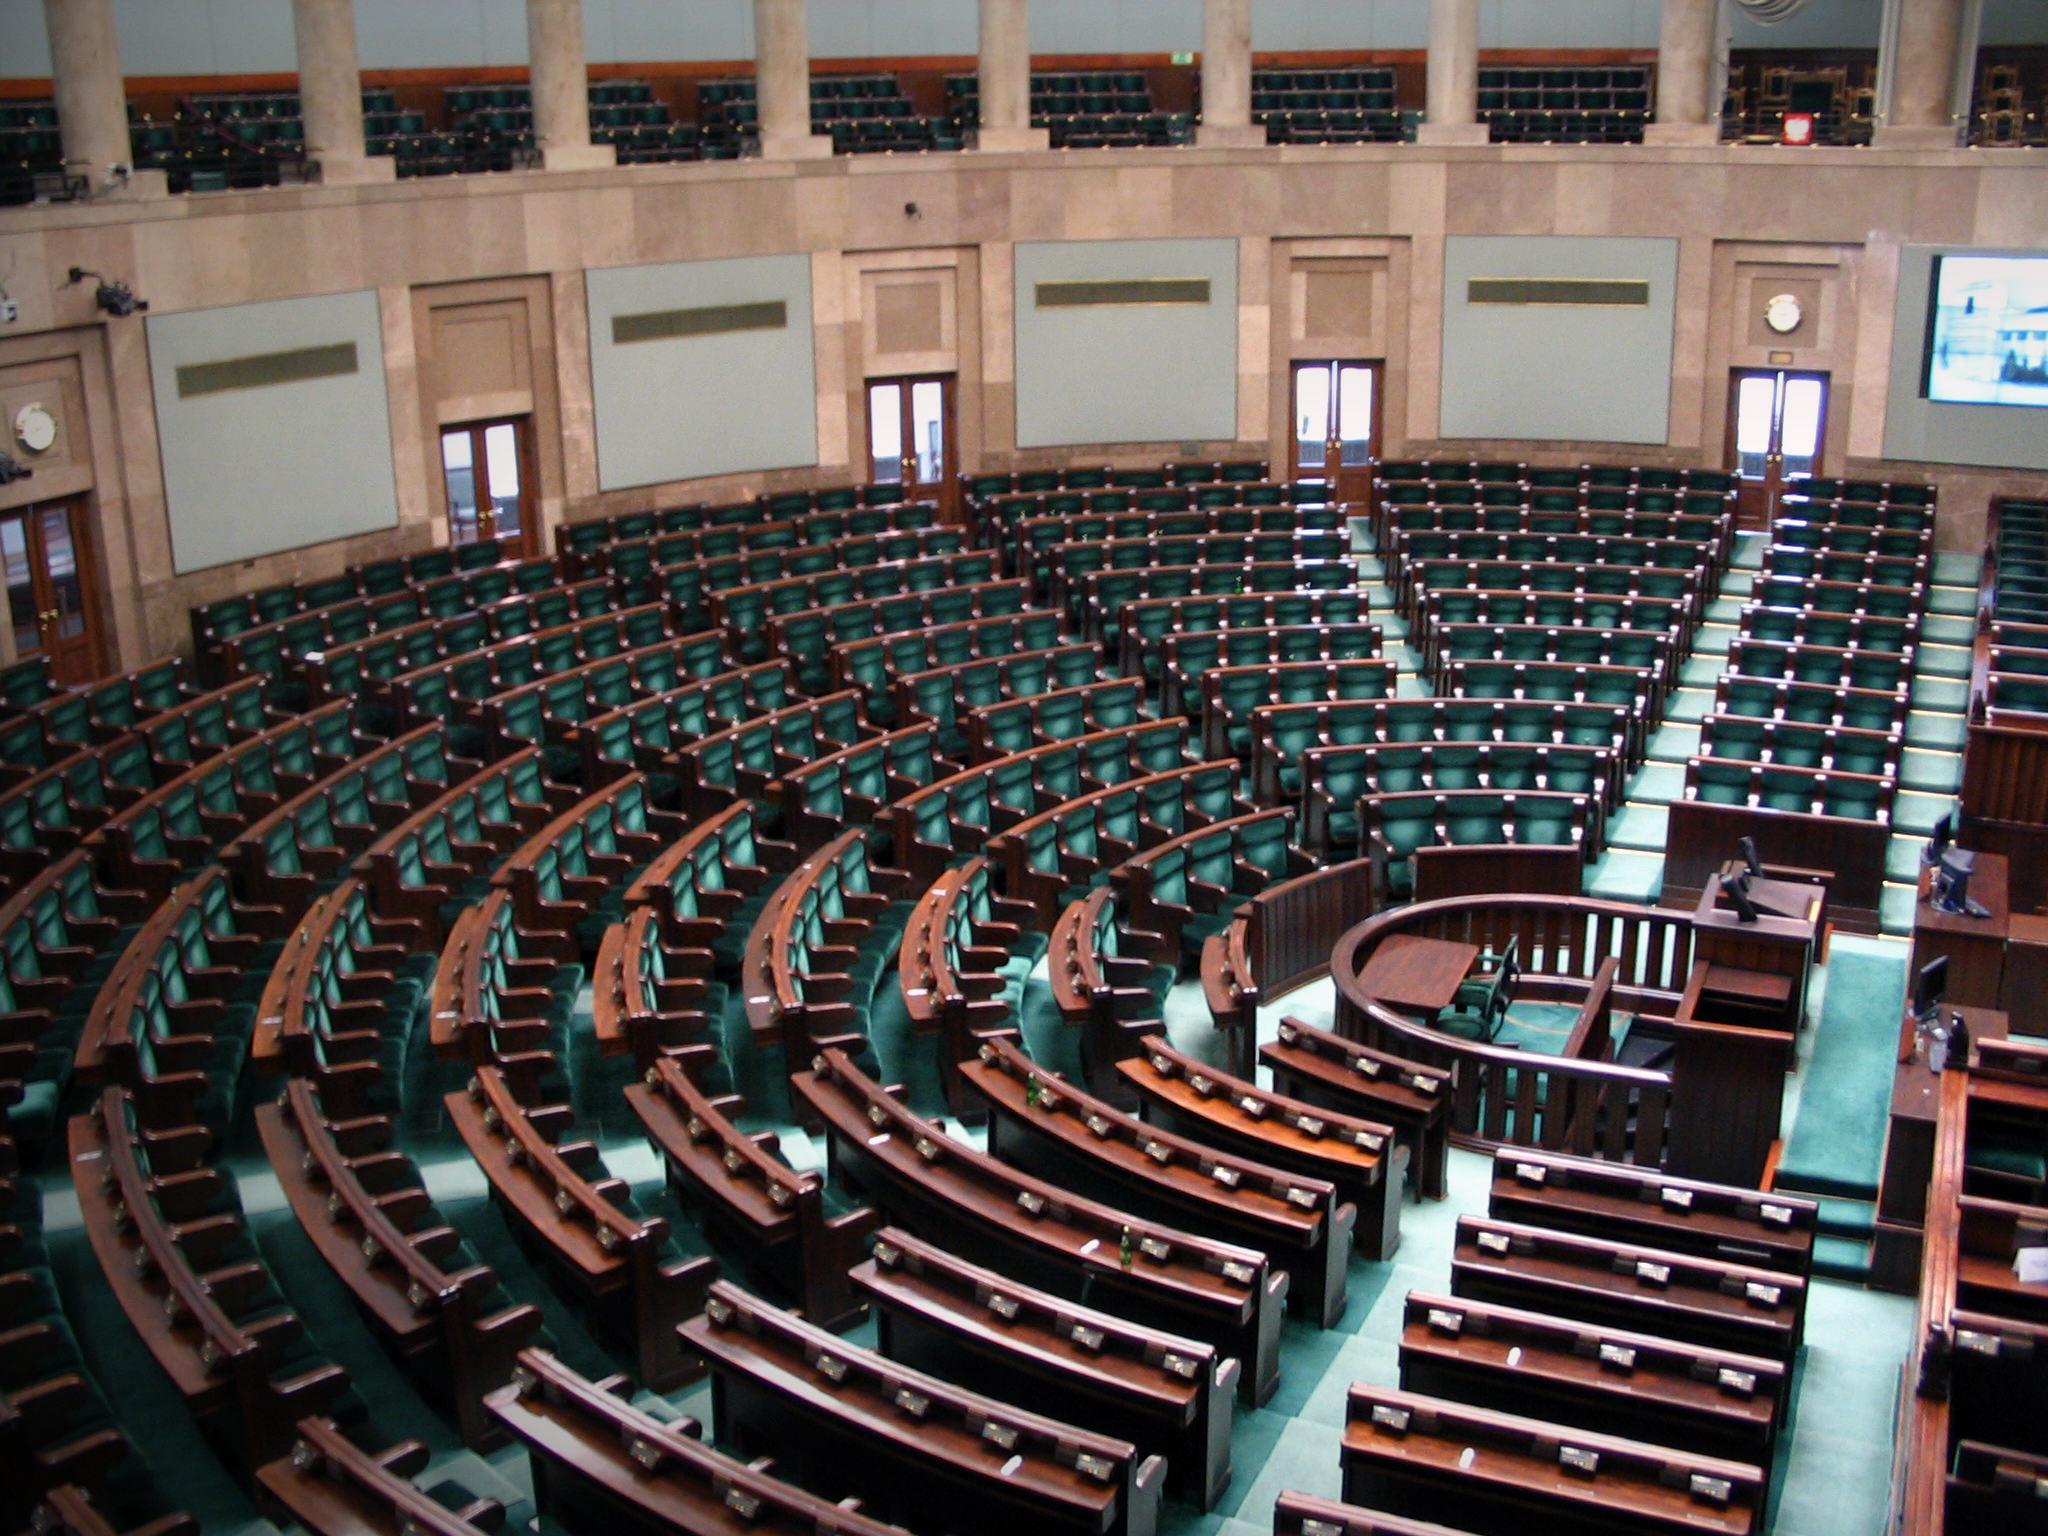 http://upload.wikimedia.org/wikipedia/commons/4/48/Sejm_433.jpg